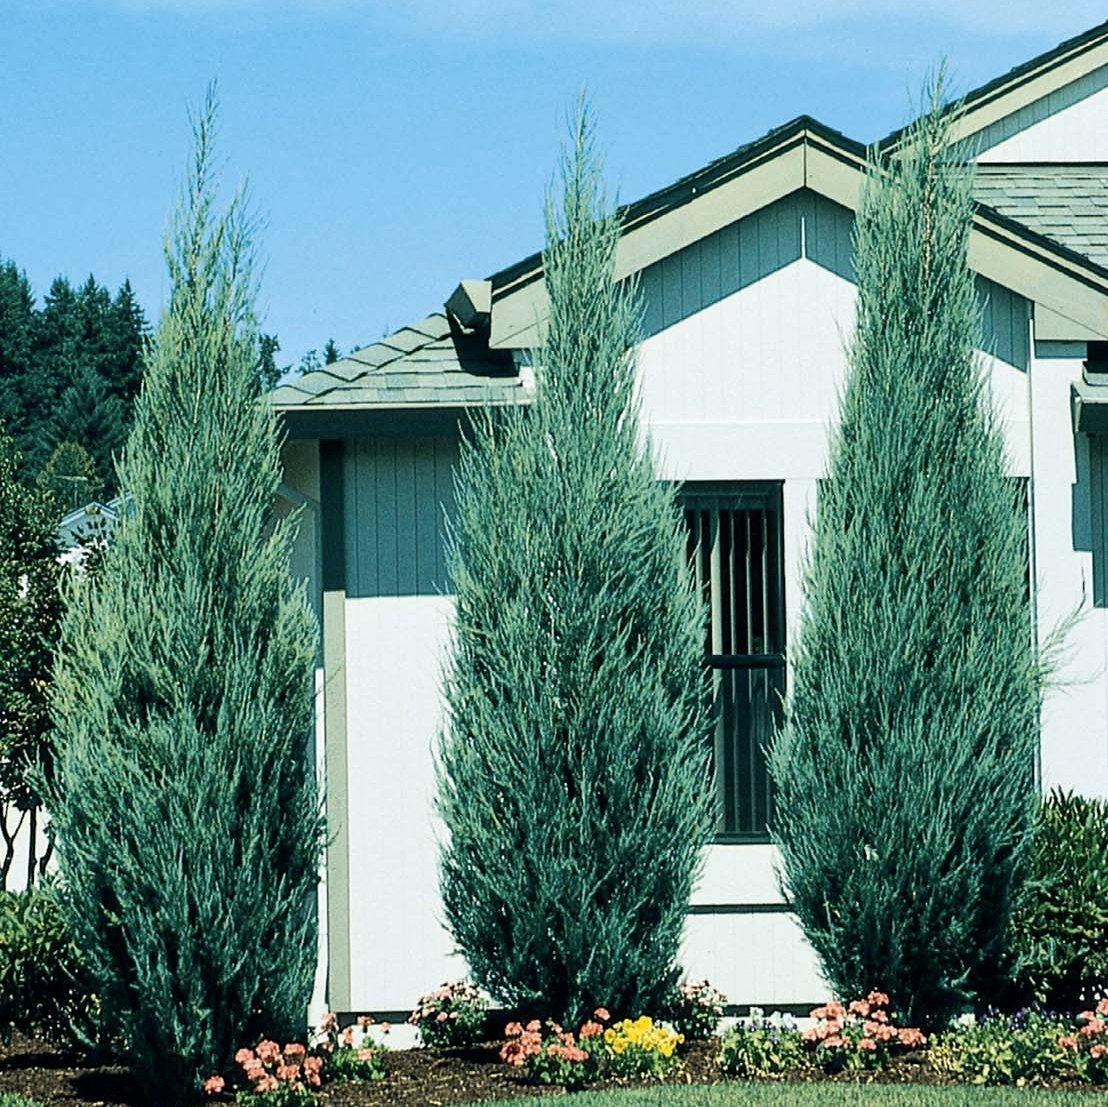 Skyrocket Juniper - 40 Live 2'' Pots - Juniperus Scopulorum - Upright Evergreen Trees by Florida Foliage (Image #4)